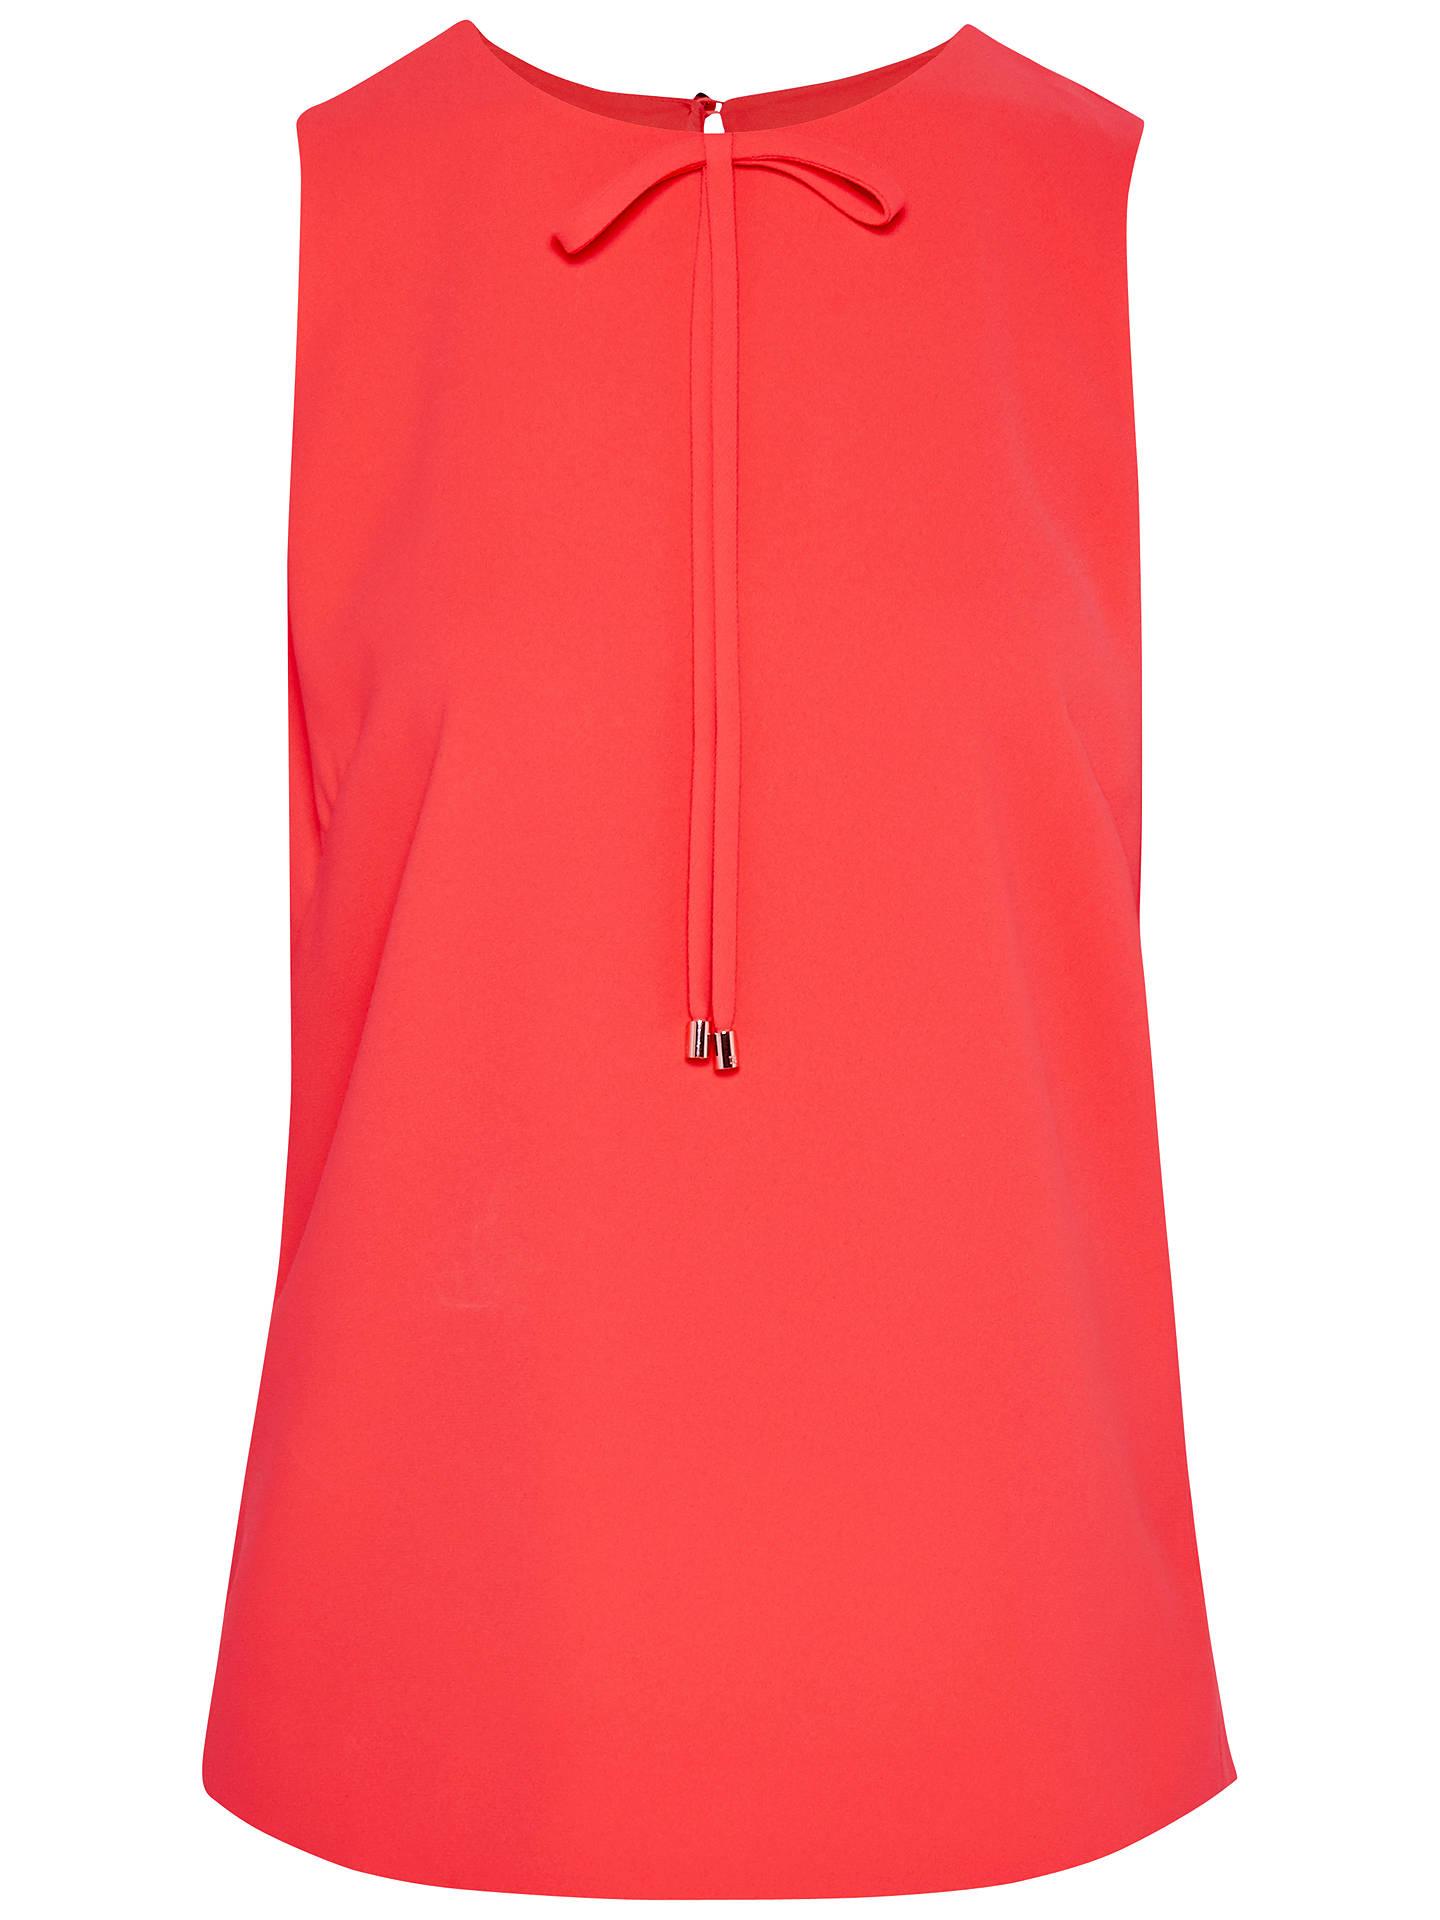 125946b9b1ca Buy Ted Baker Olia Crepe Bow Top, Orange, 0 Online at johnlewis.com ...